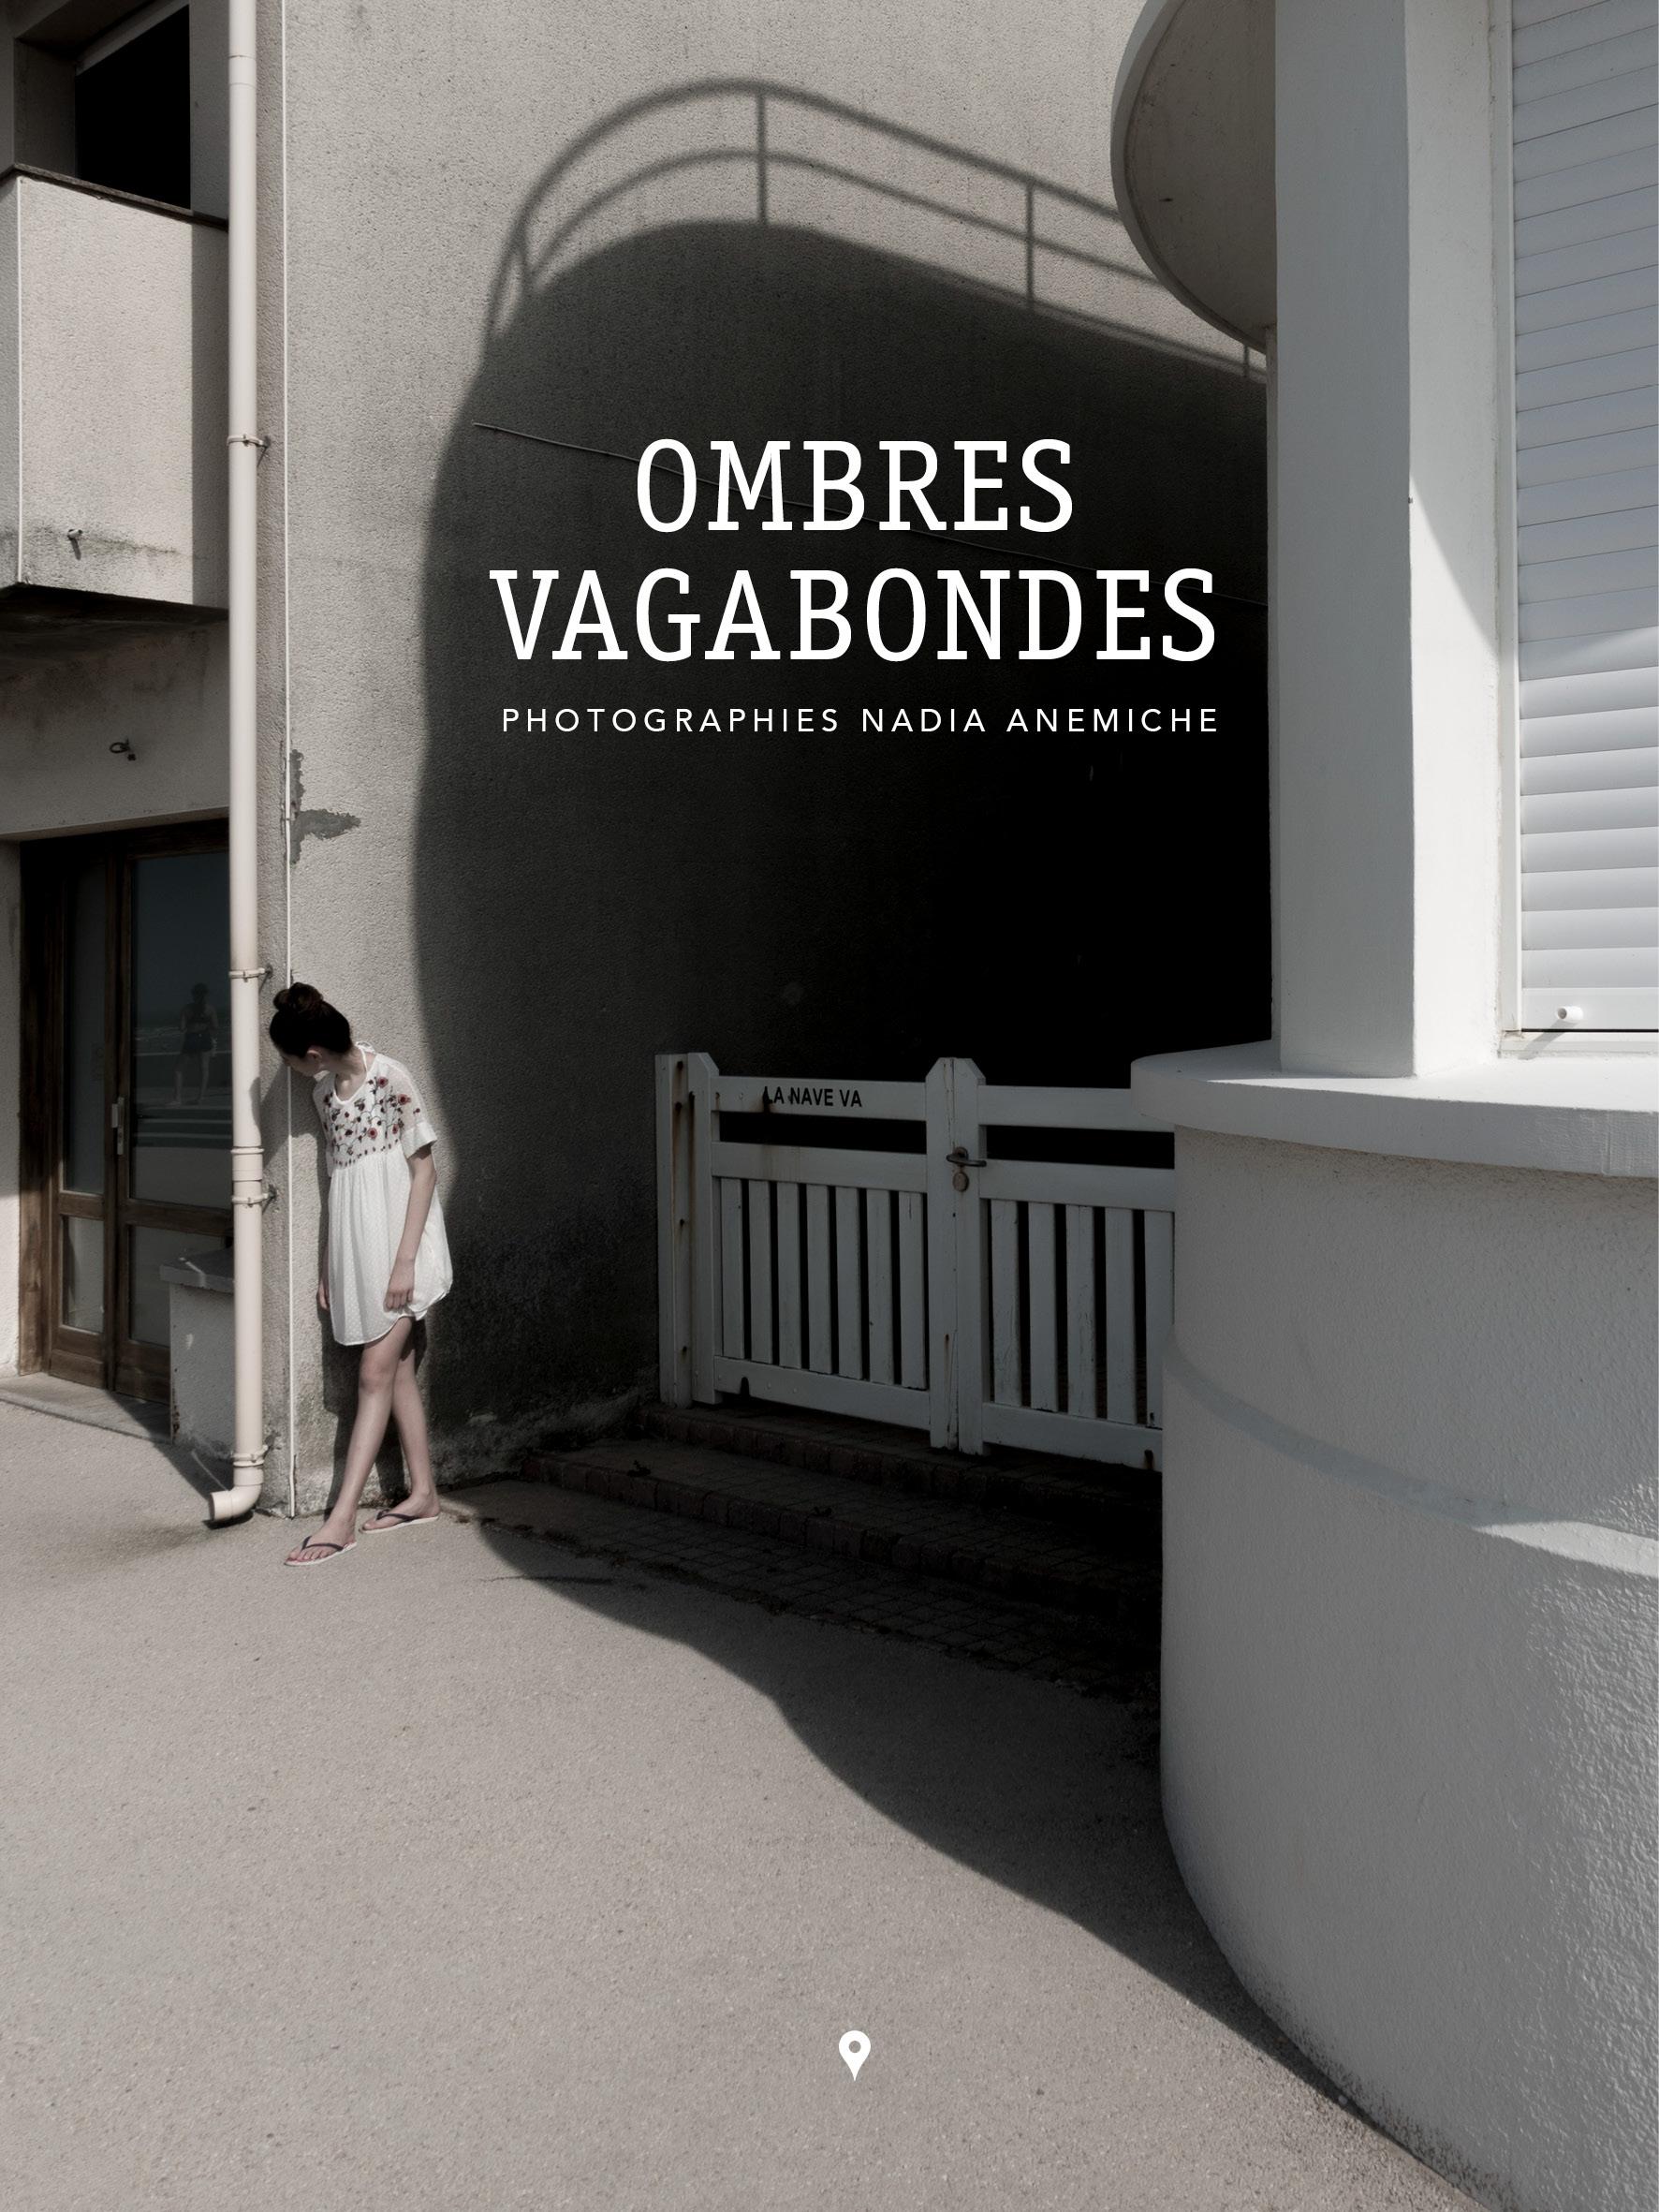 OMBRES VAGABONDES